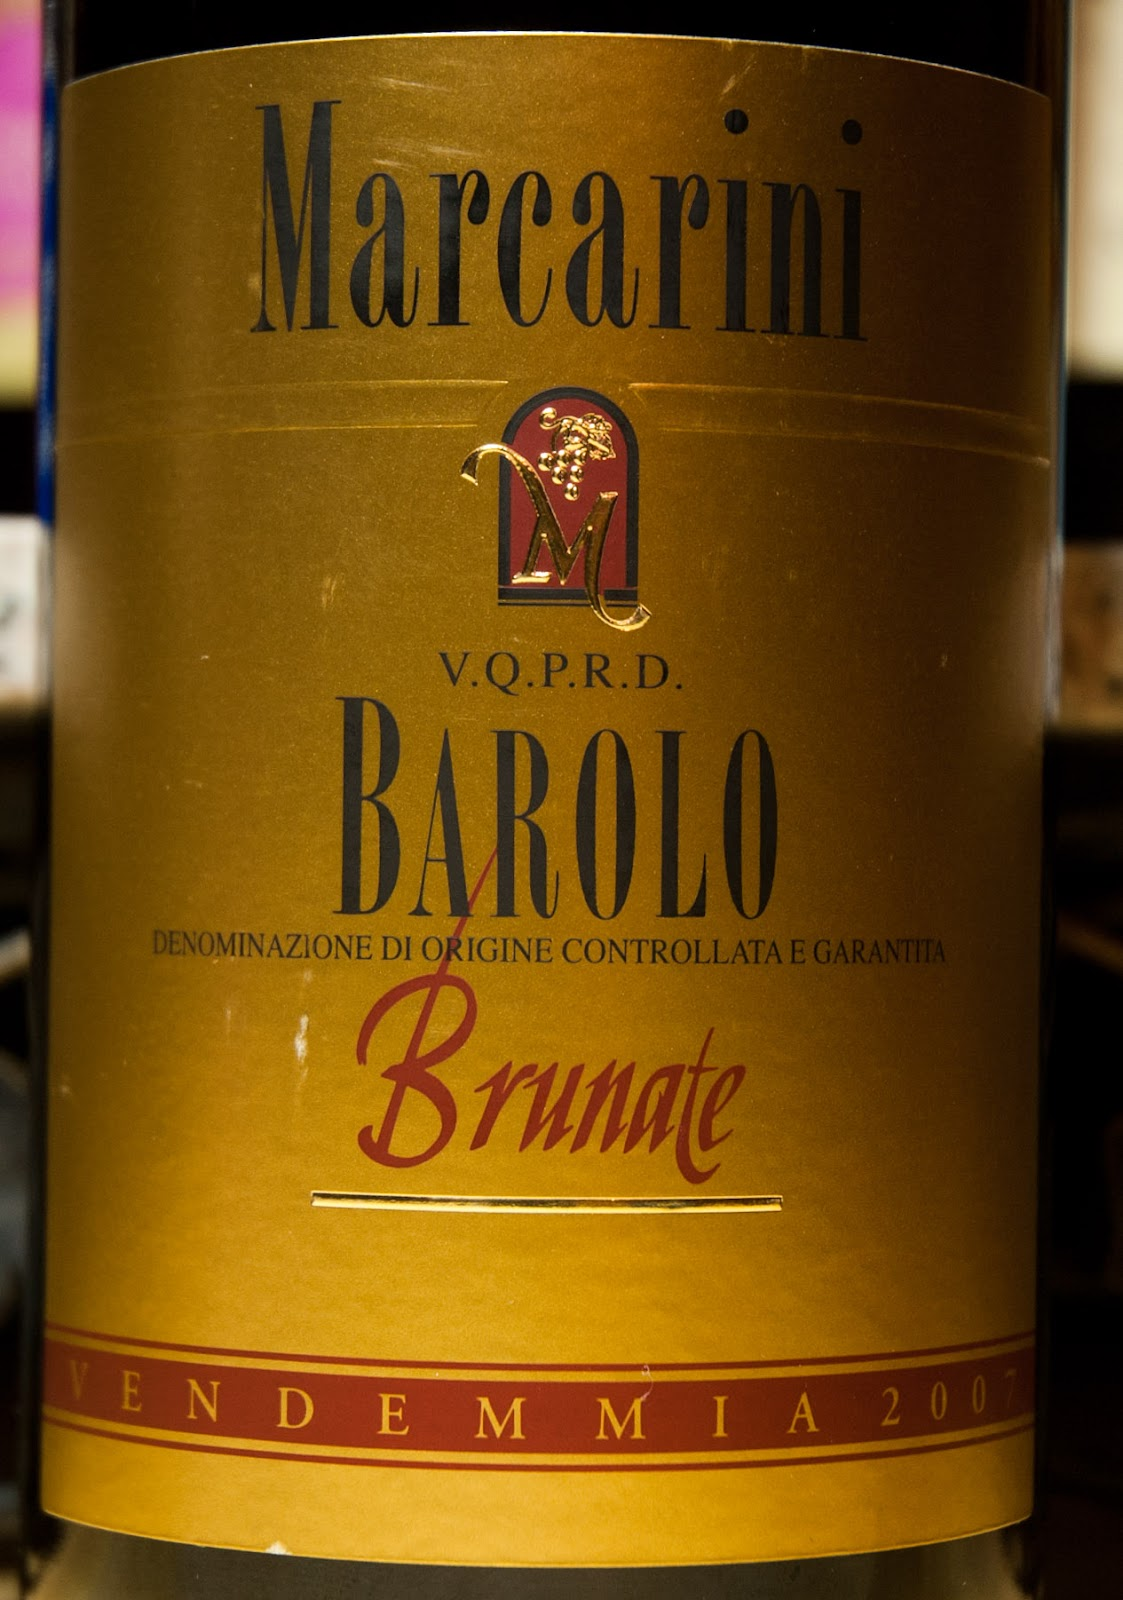 Brunate Barolo Vineyard 2007 Marcarini Barolo Brunate